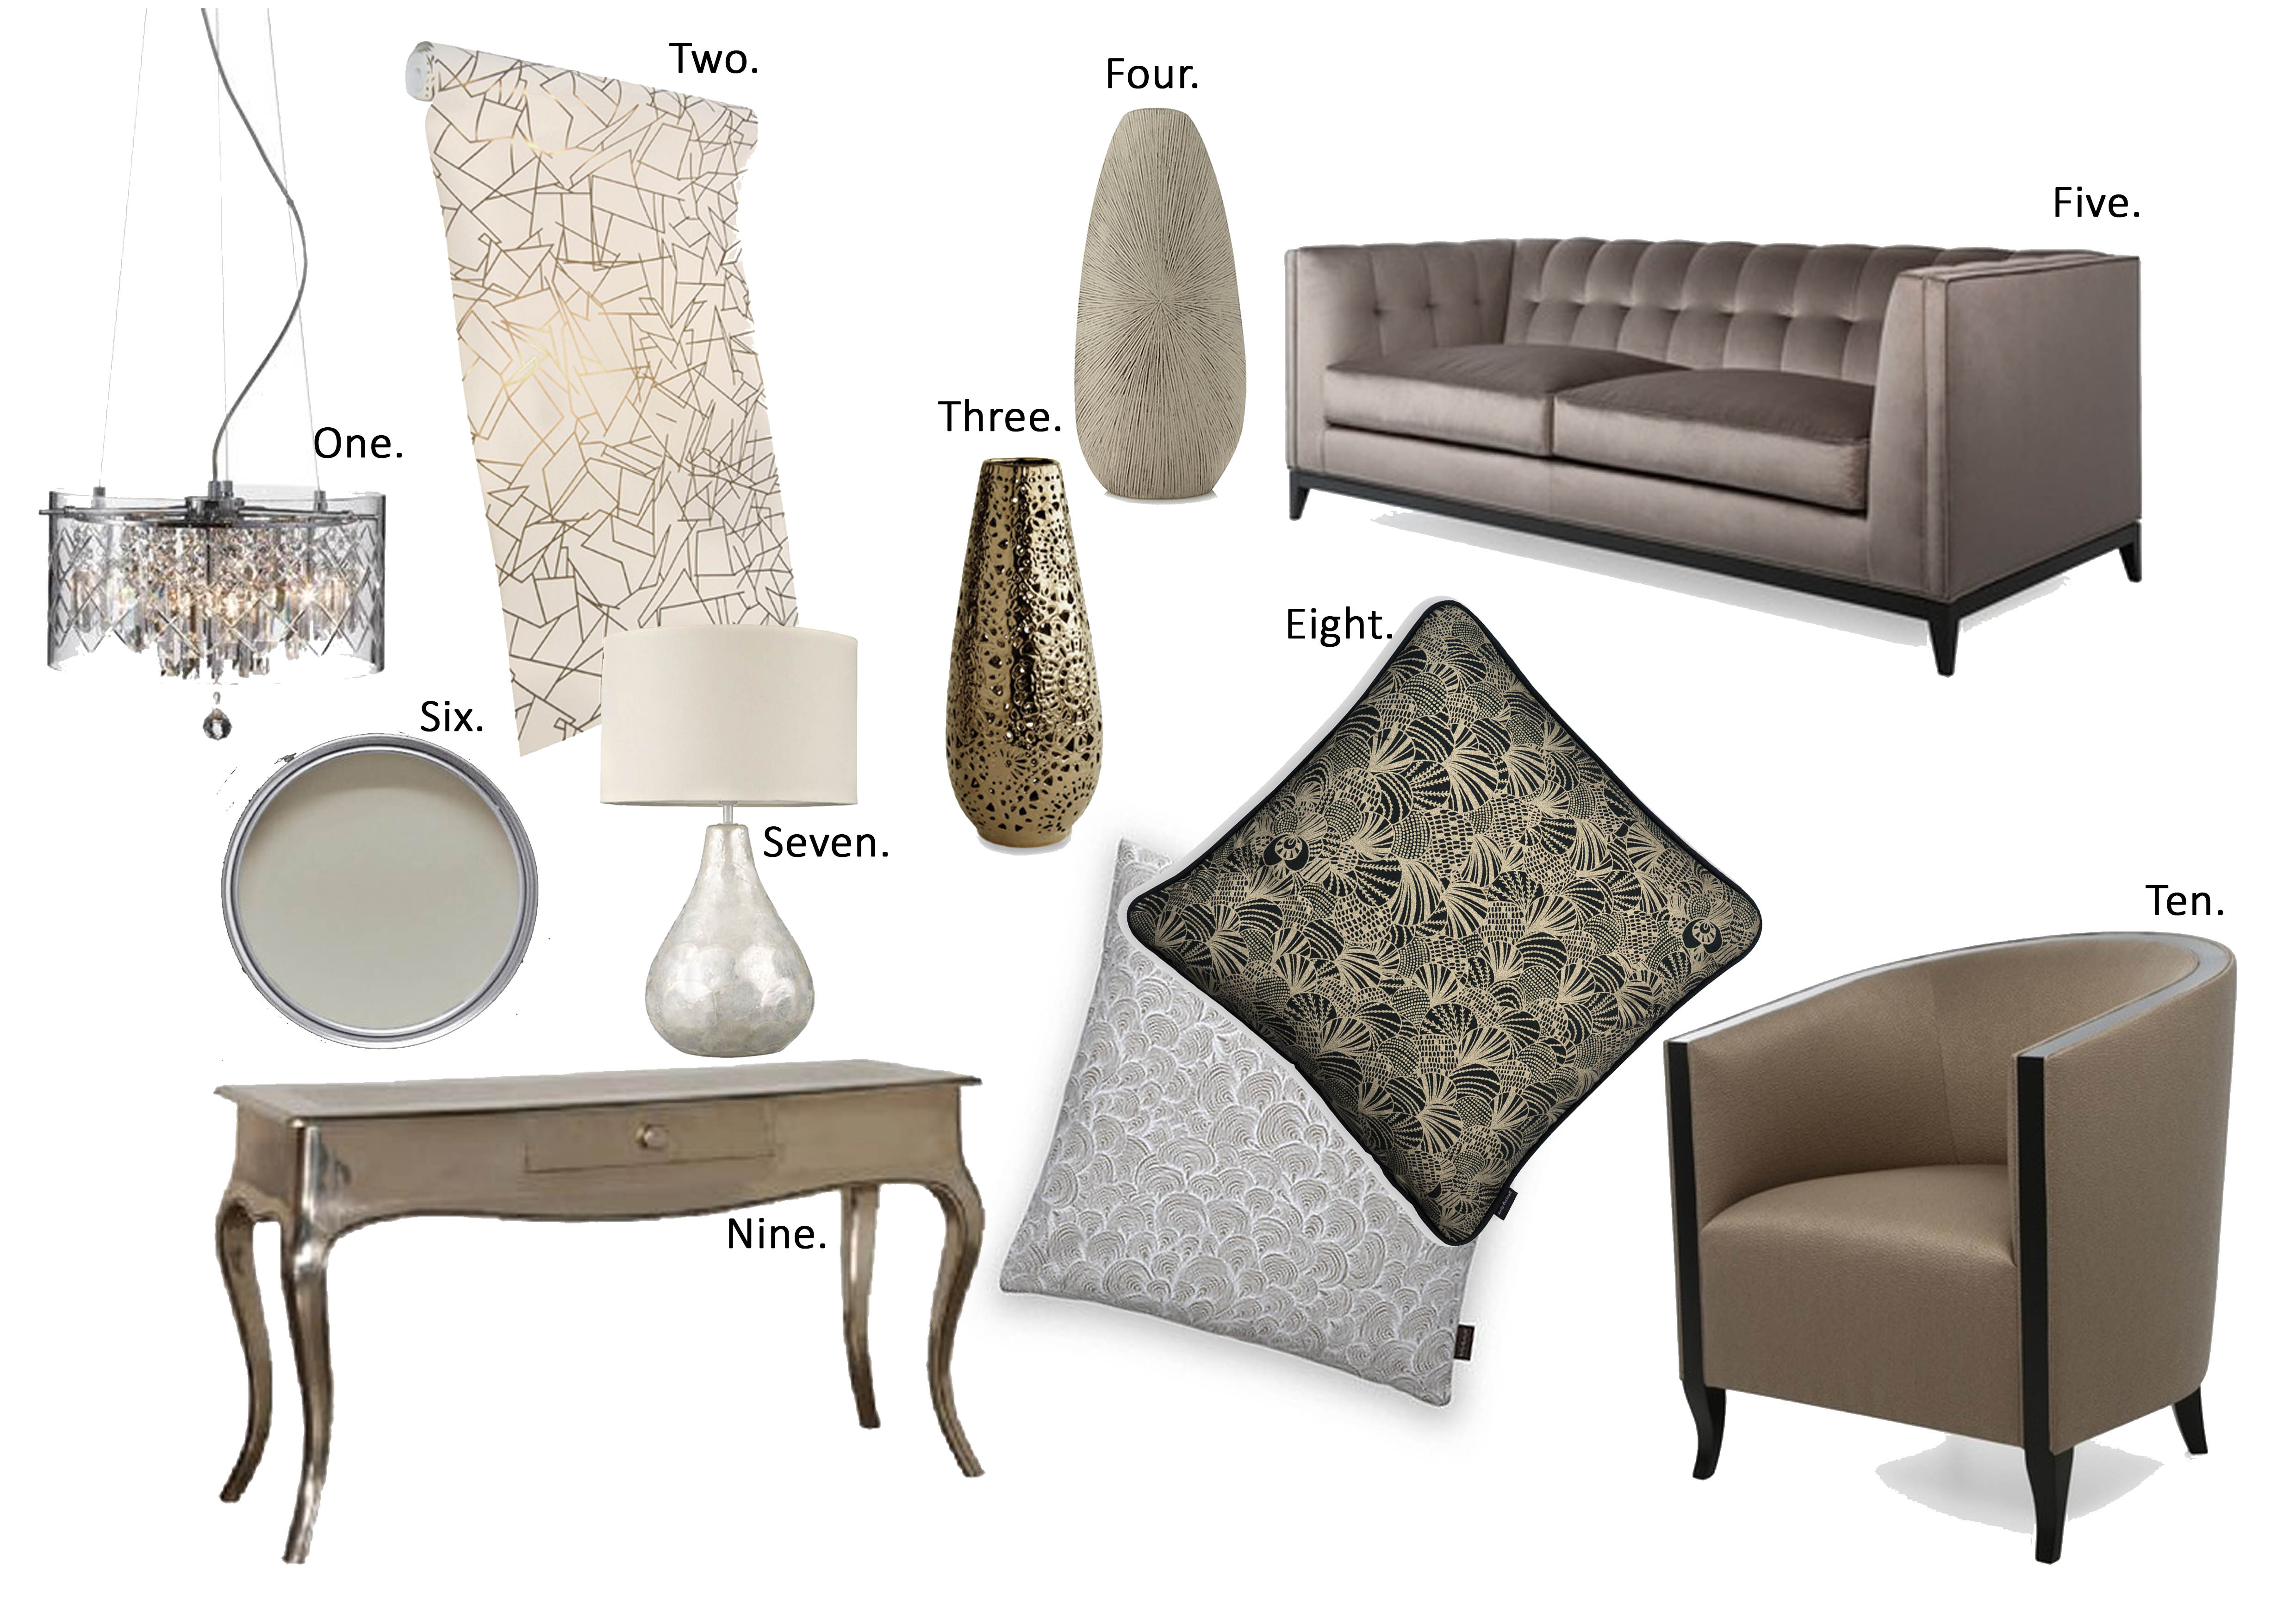 charity sofa pick up sf cinema salvation army donation furniture